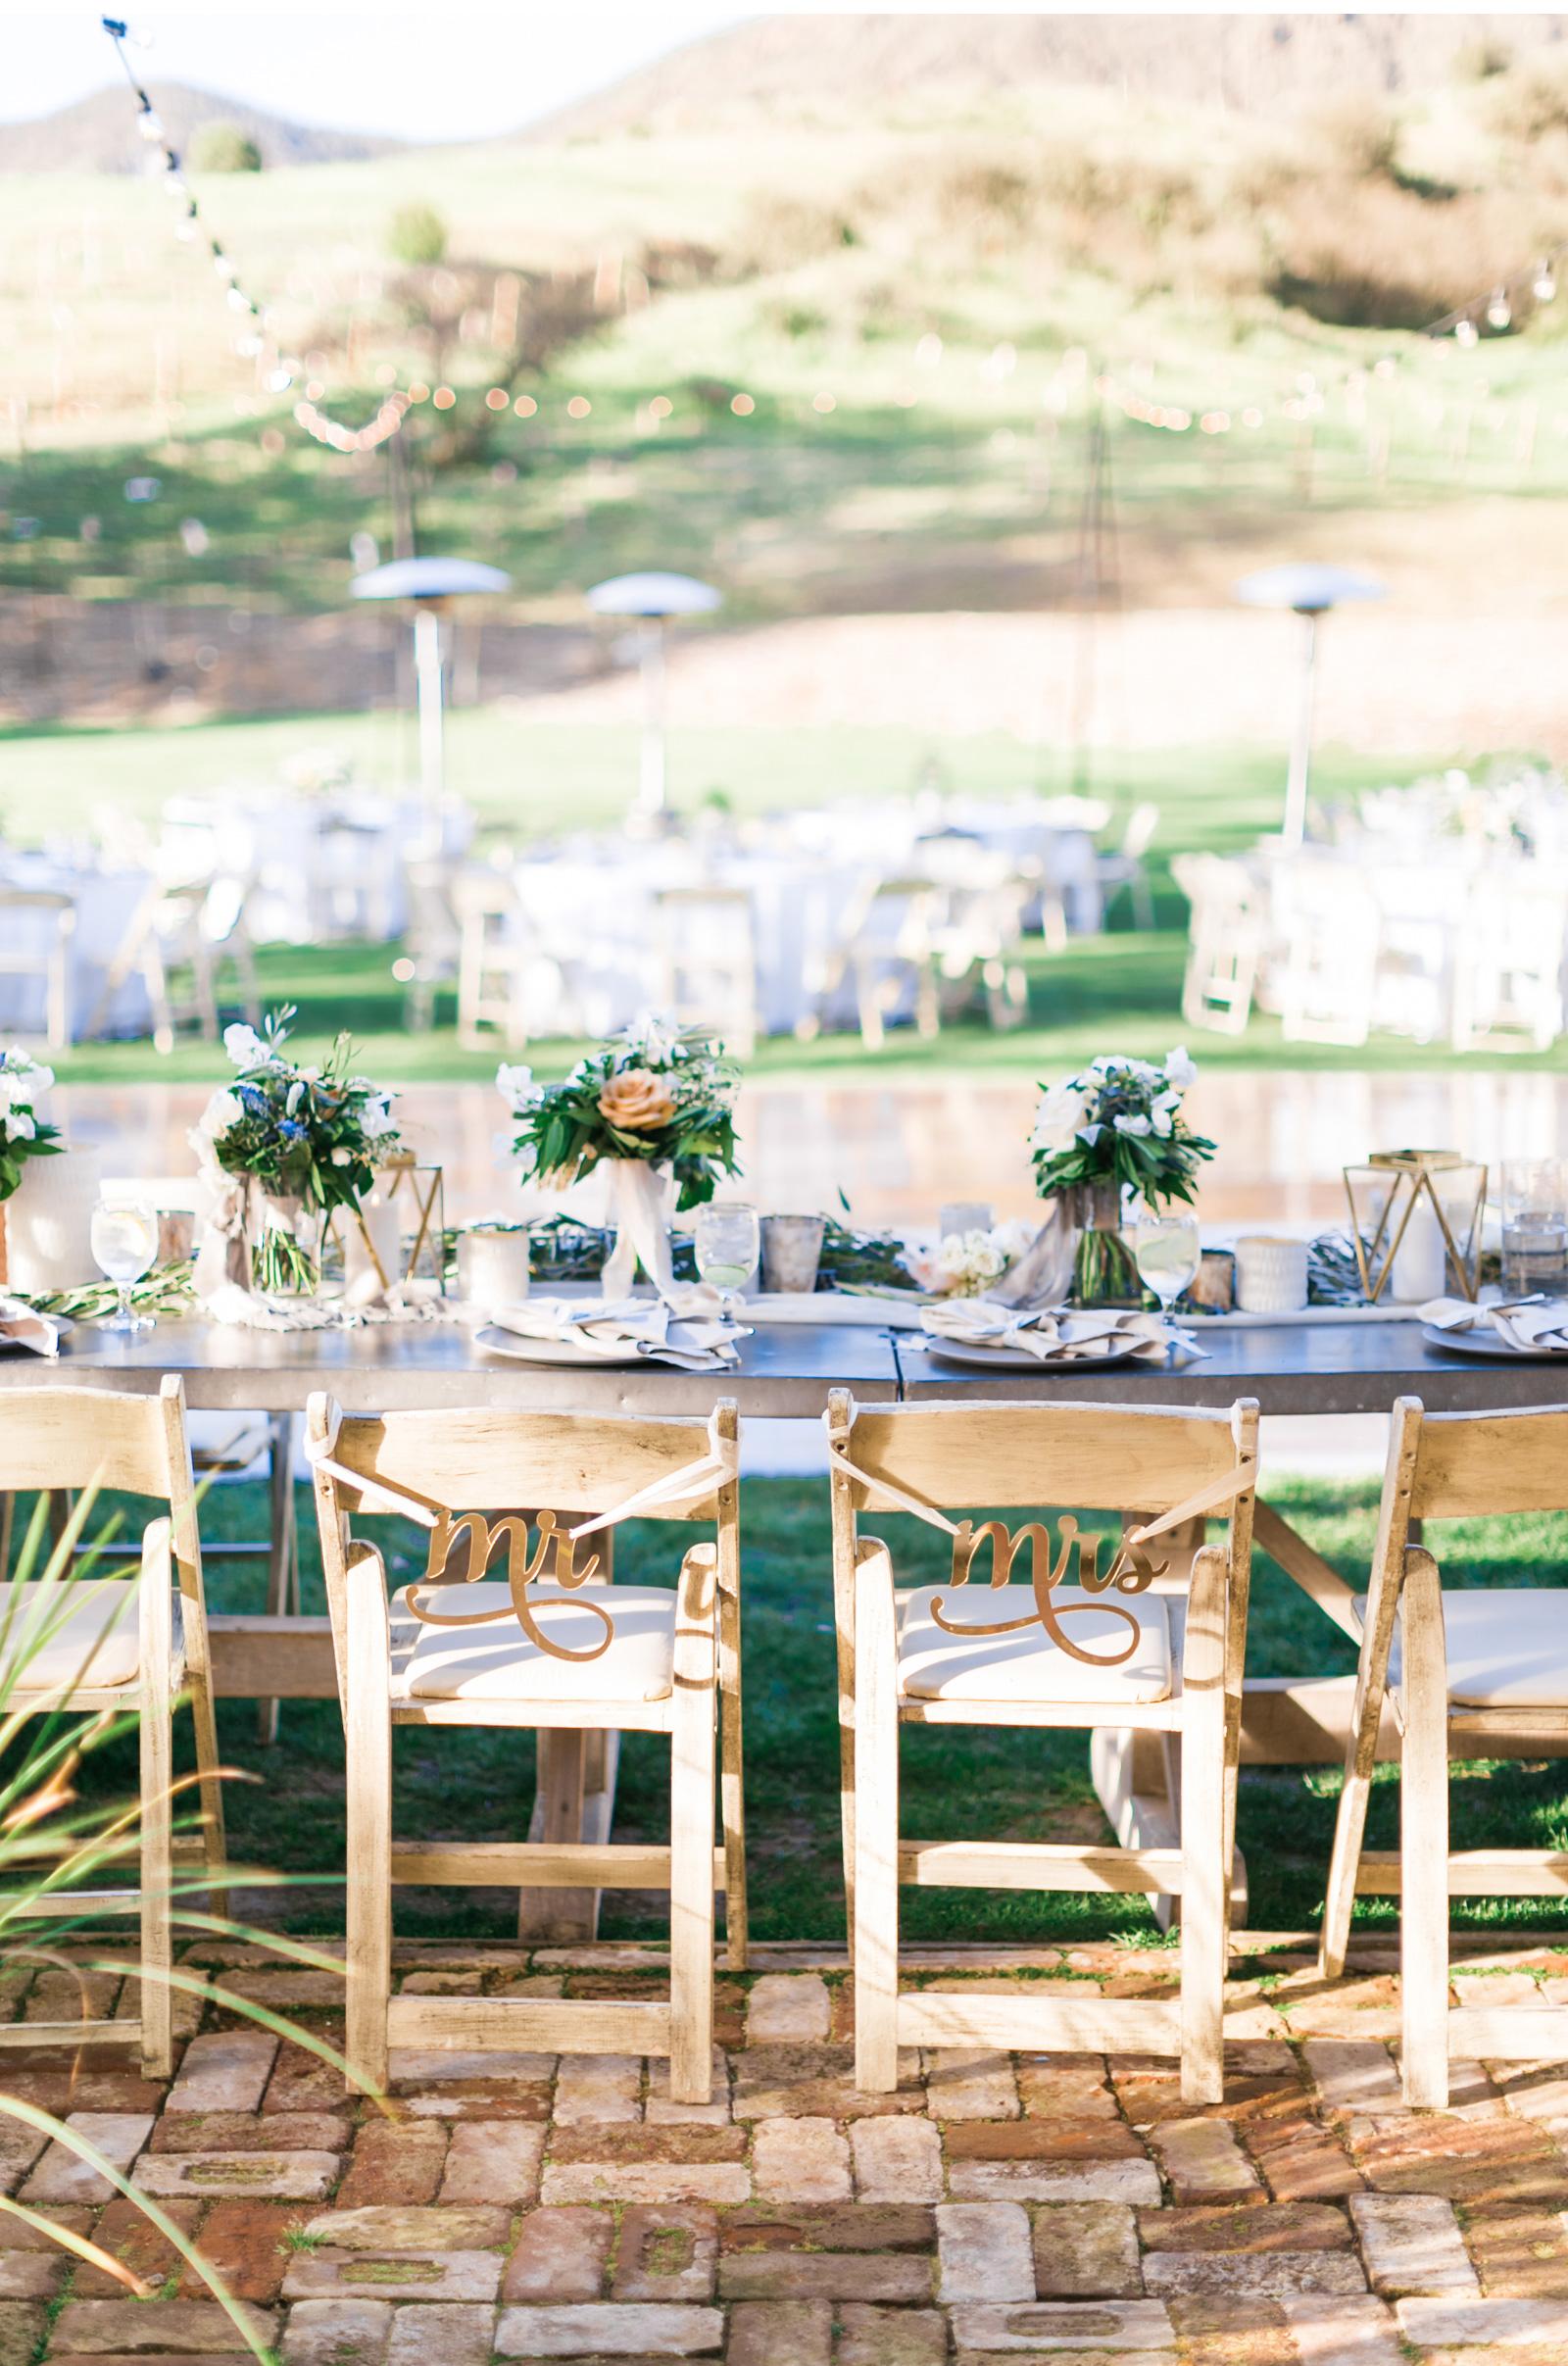 Triunfo-Creek-Malibu-Wedding-Natalie-Schutt-Photography-Couture-Events-Style-Me-Pretty_14.jpg